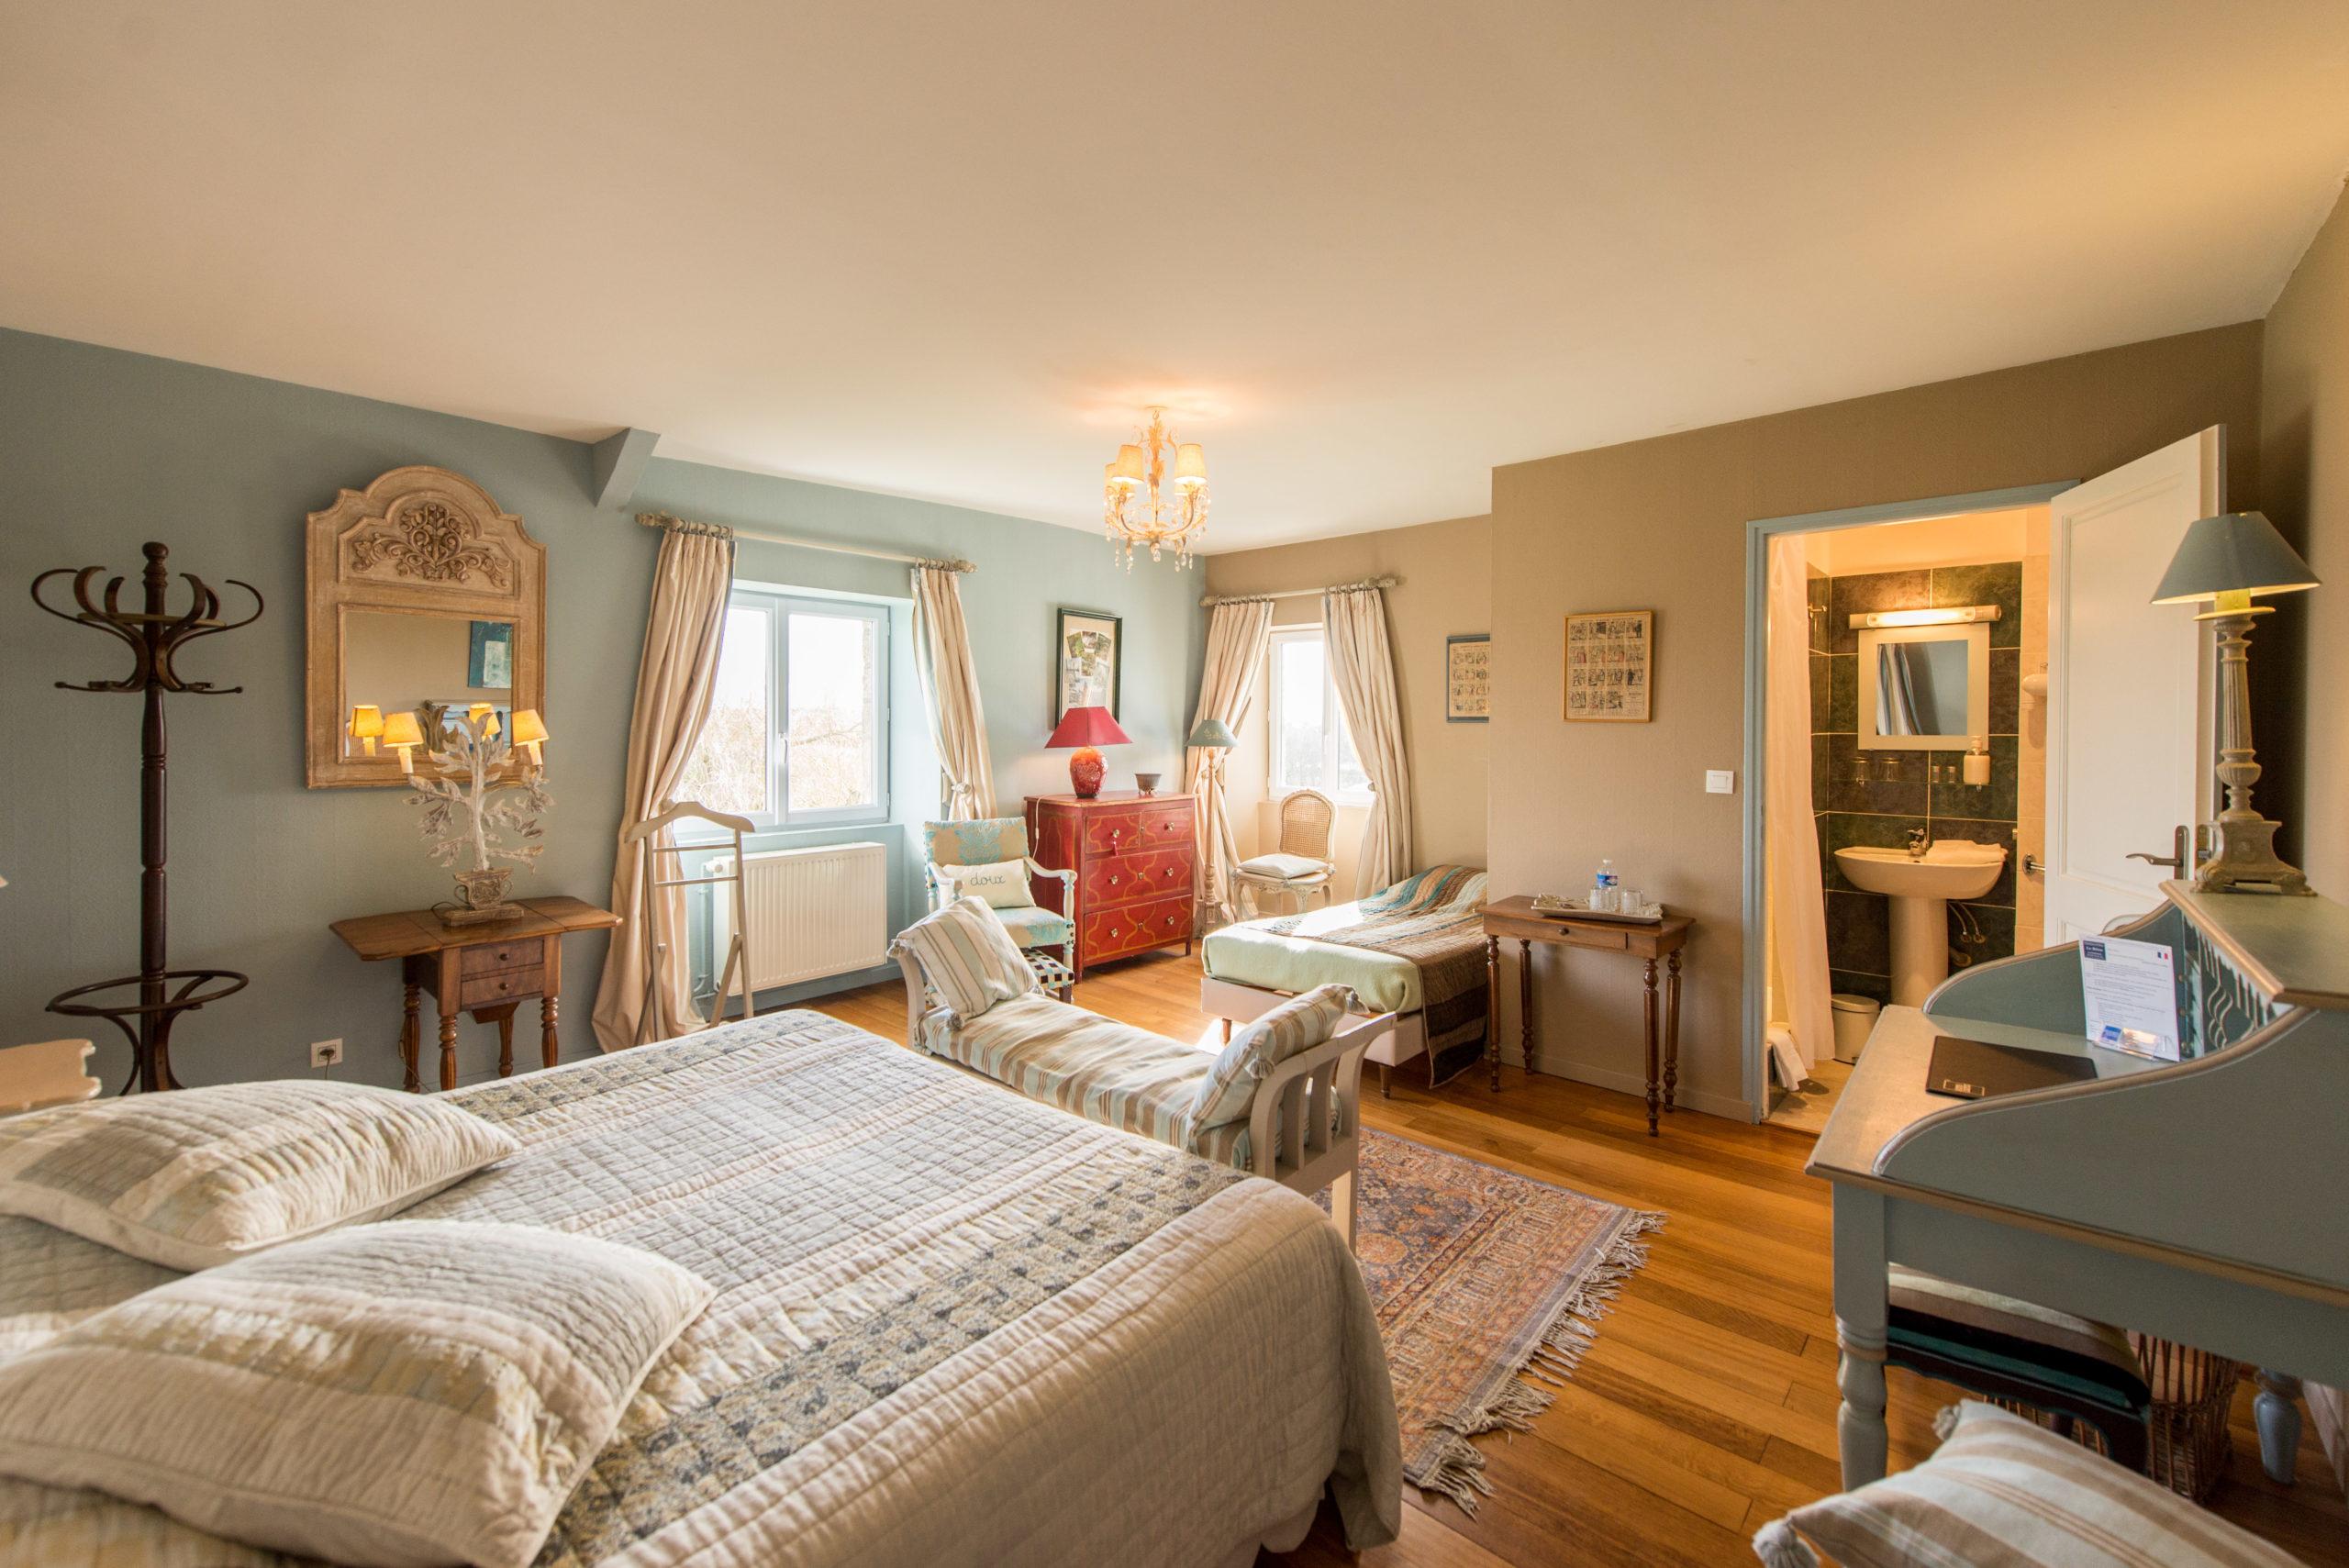 casa senhorial B&B La Barbinais chambres hotes saint malo poplar king size bed bathroom